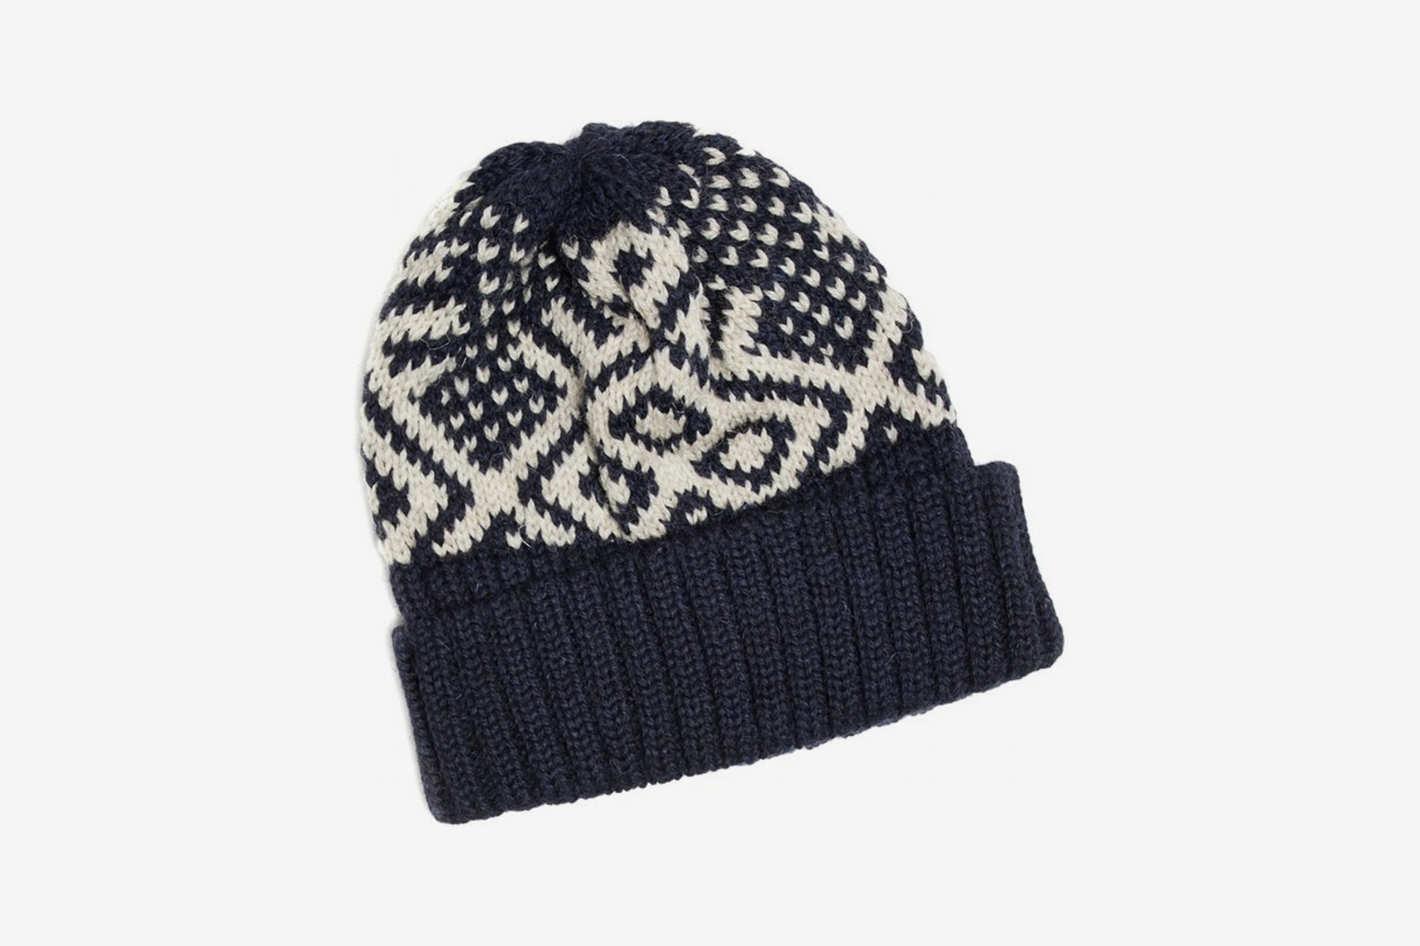 aa719795d06 Todd Snyder Menswear Winter Sale 2019